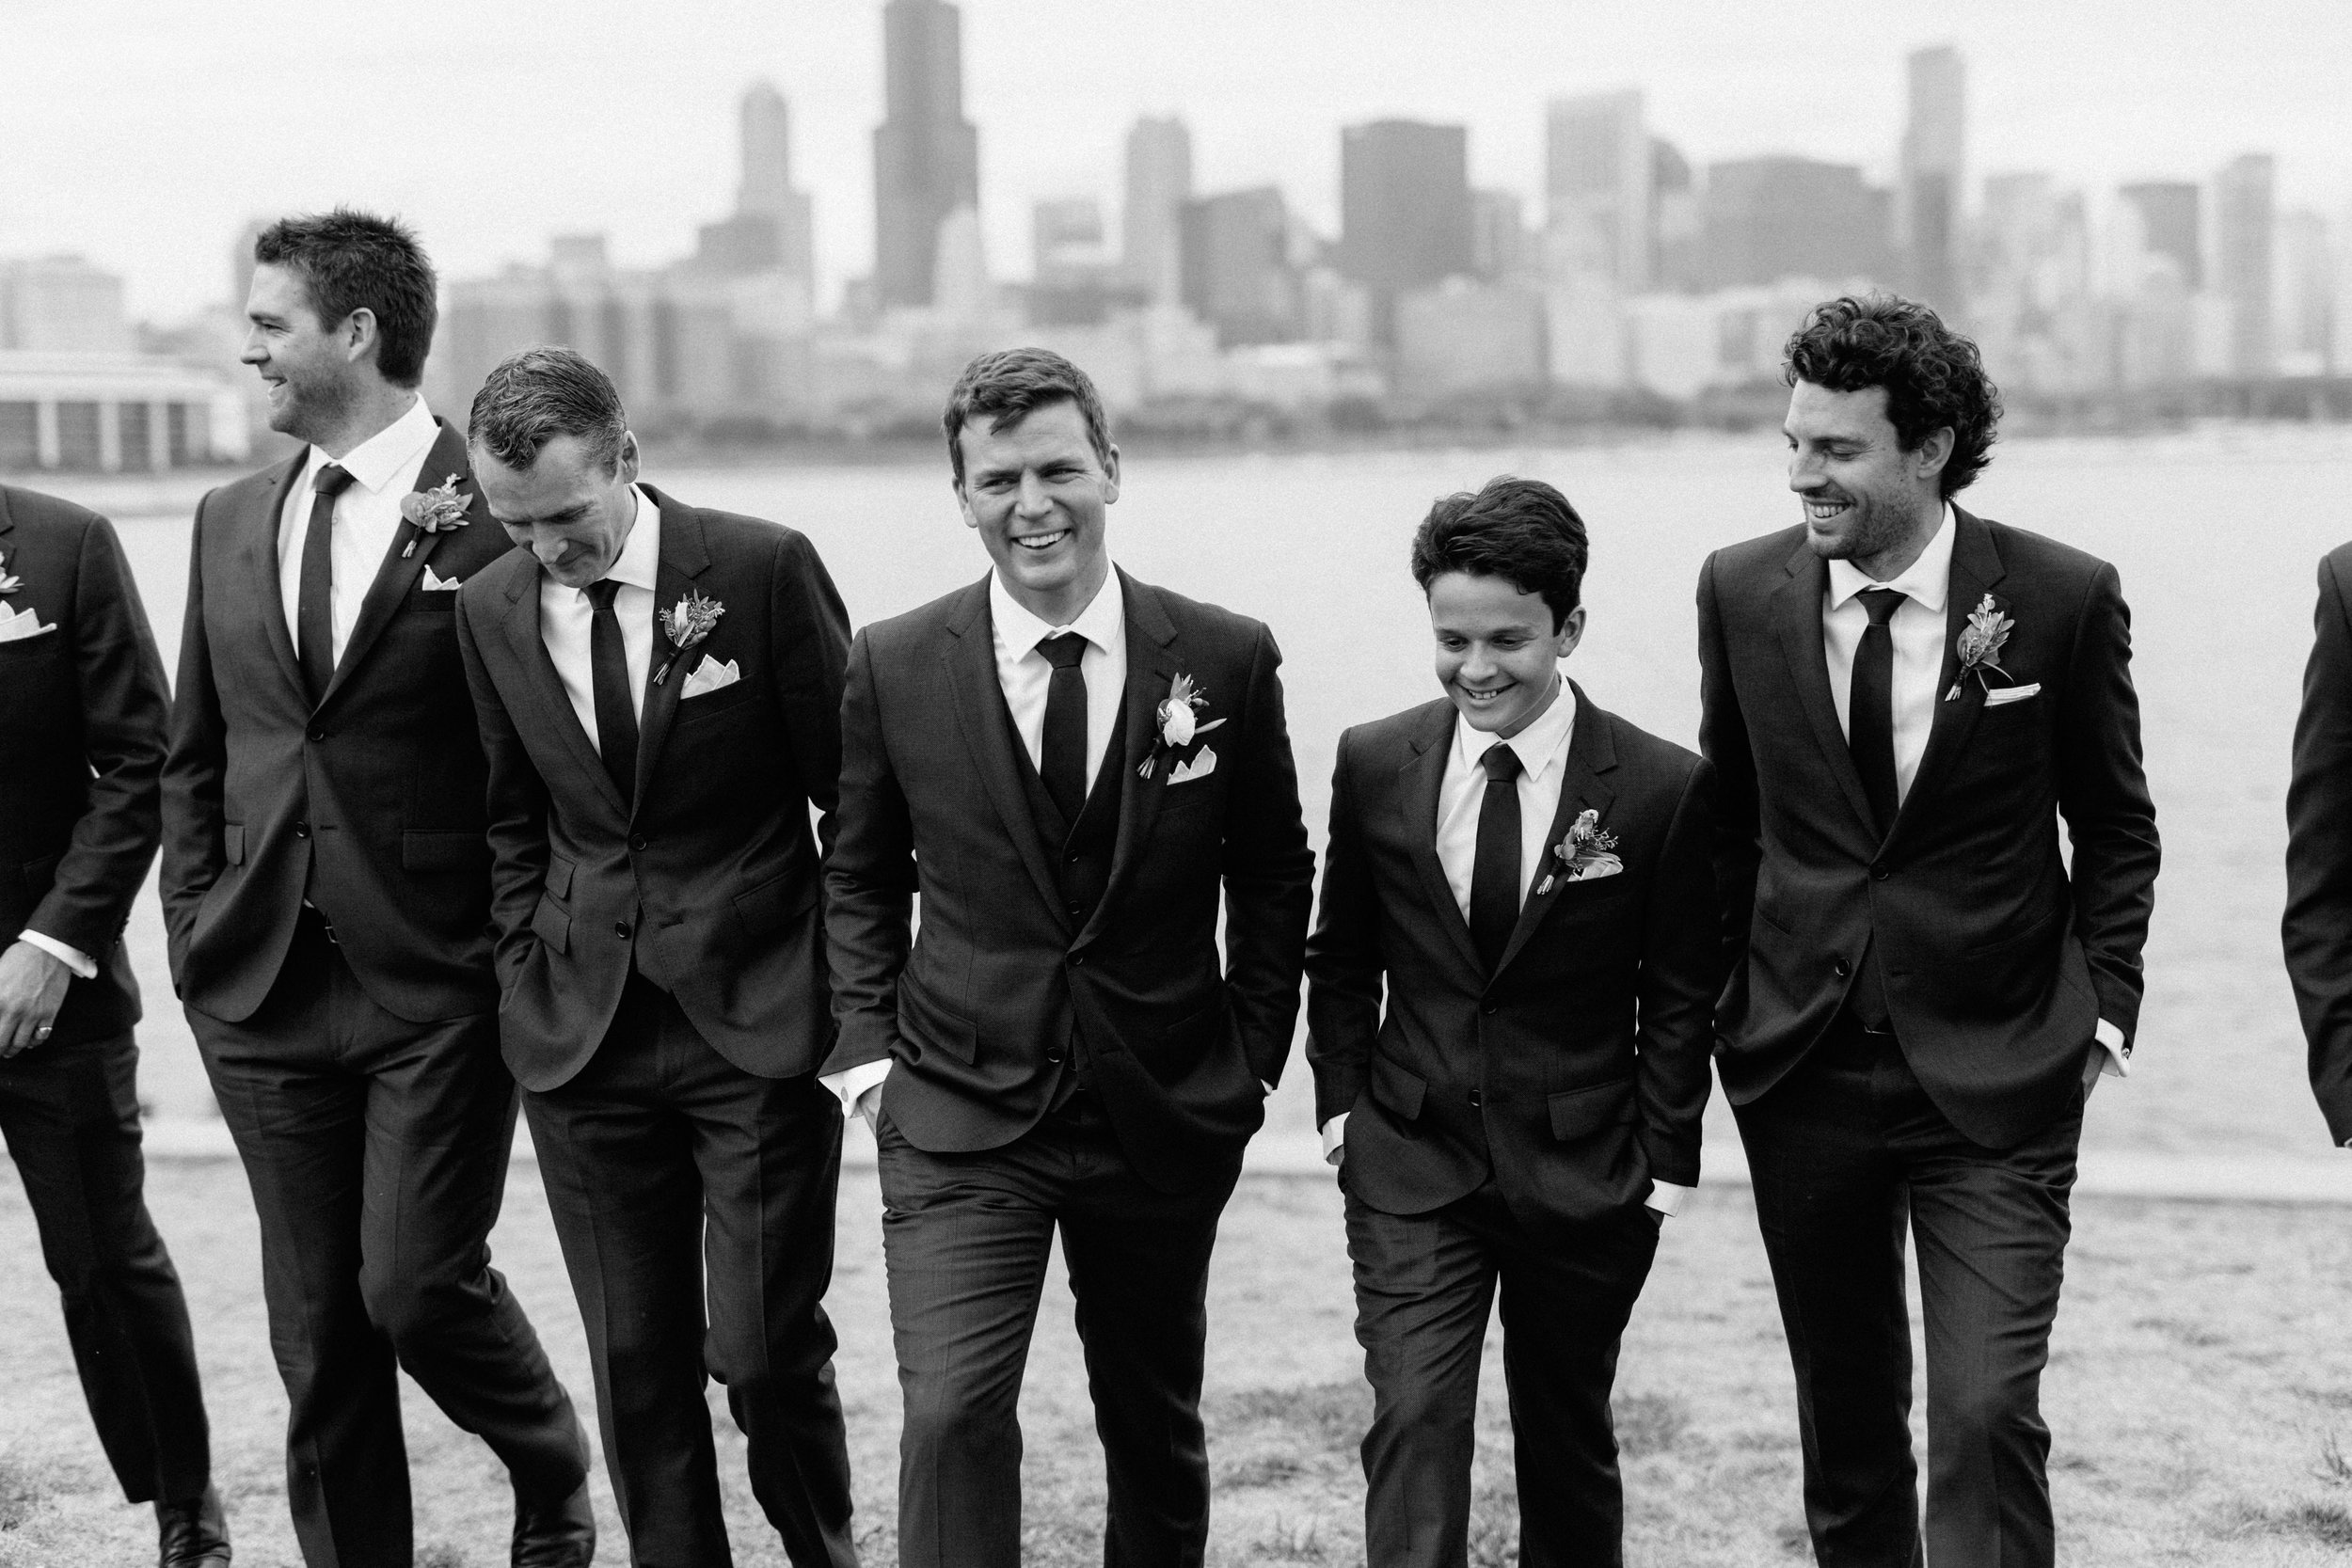 chicago-illuminating-company-wedding-048.jpg